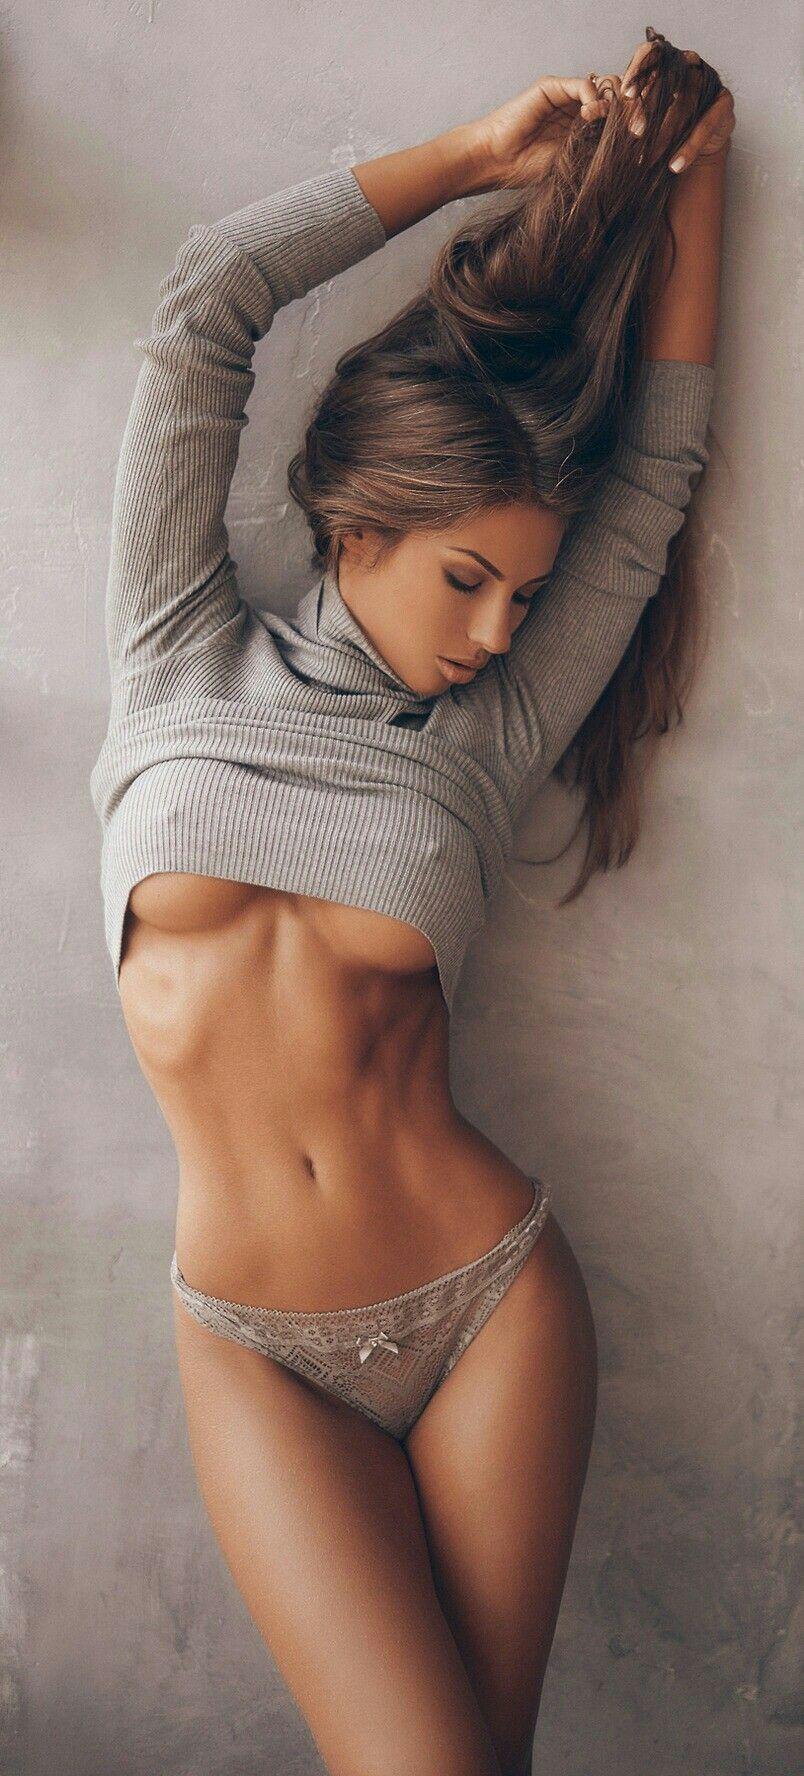 bikini-stripping-women